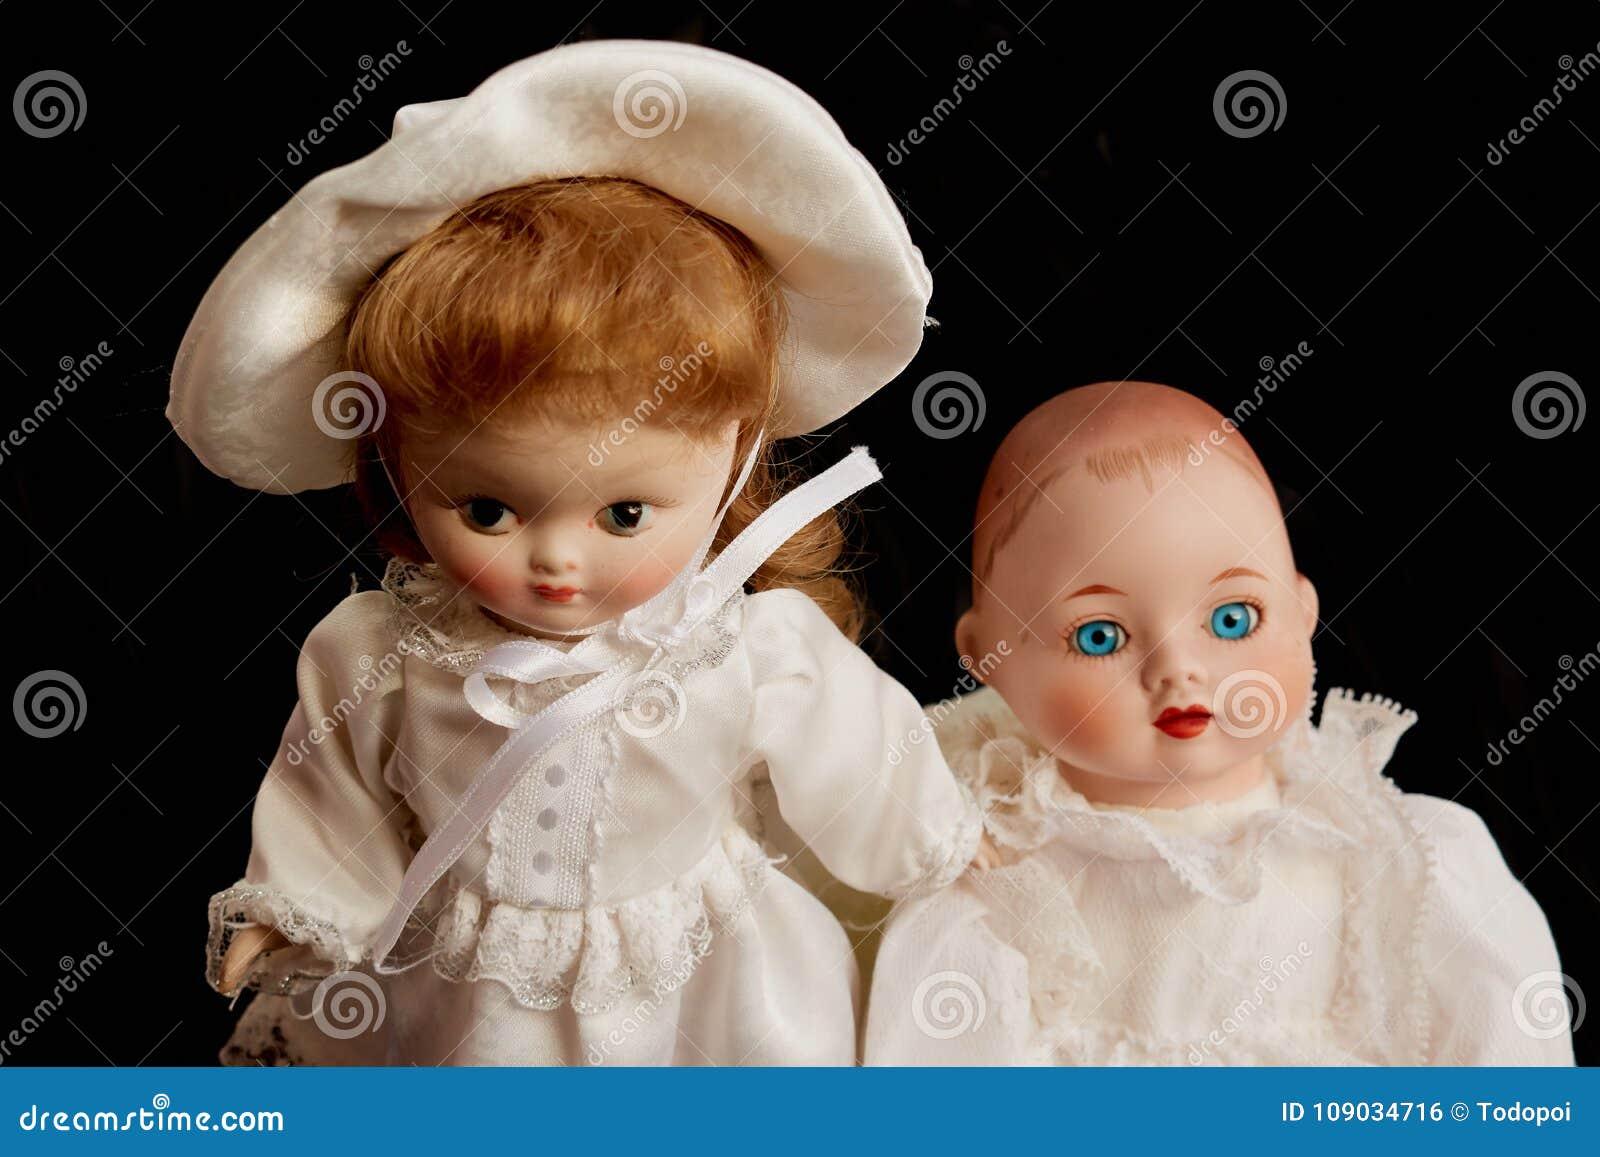 Closeup of two old porcelain dolls on black background